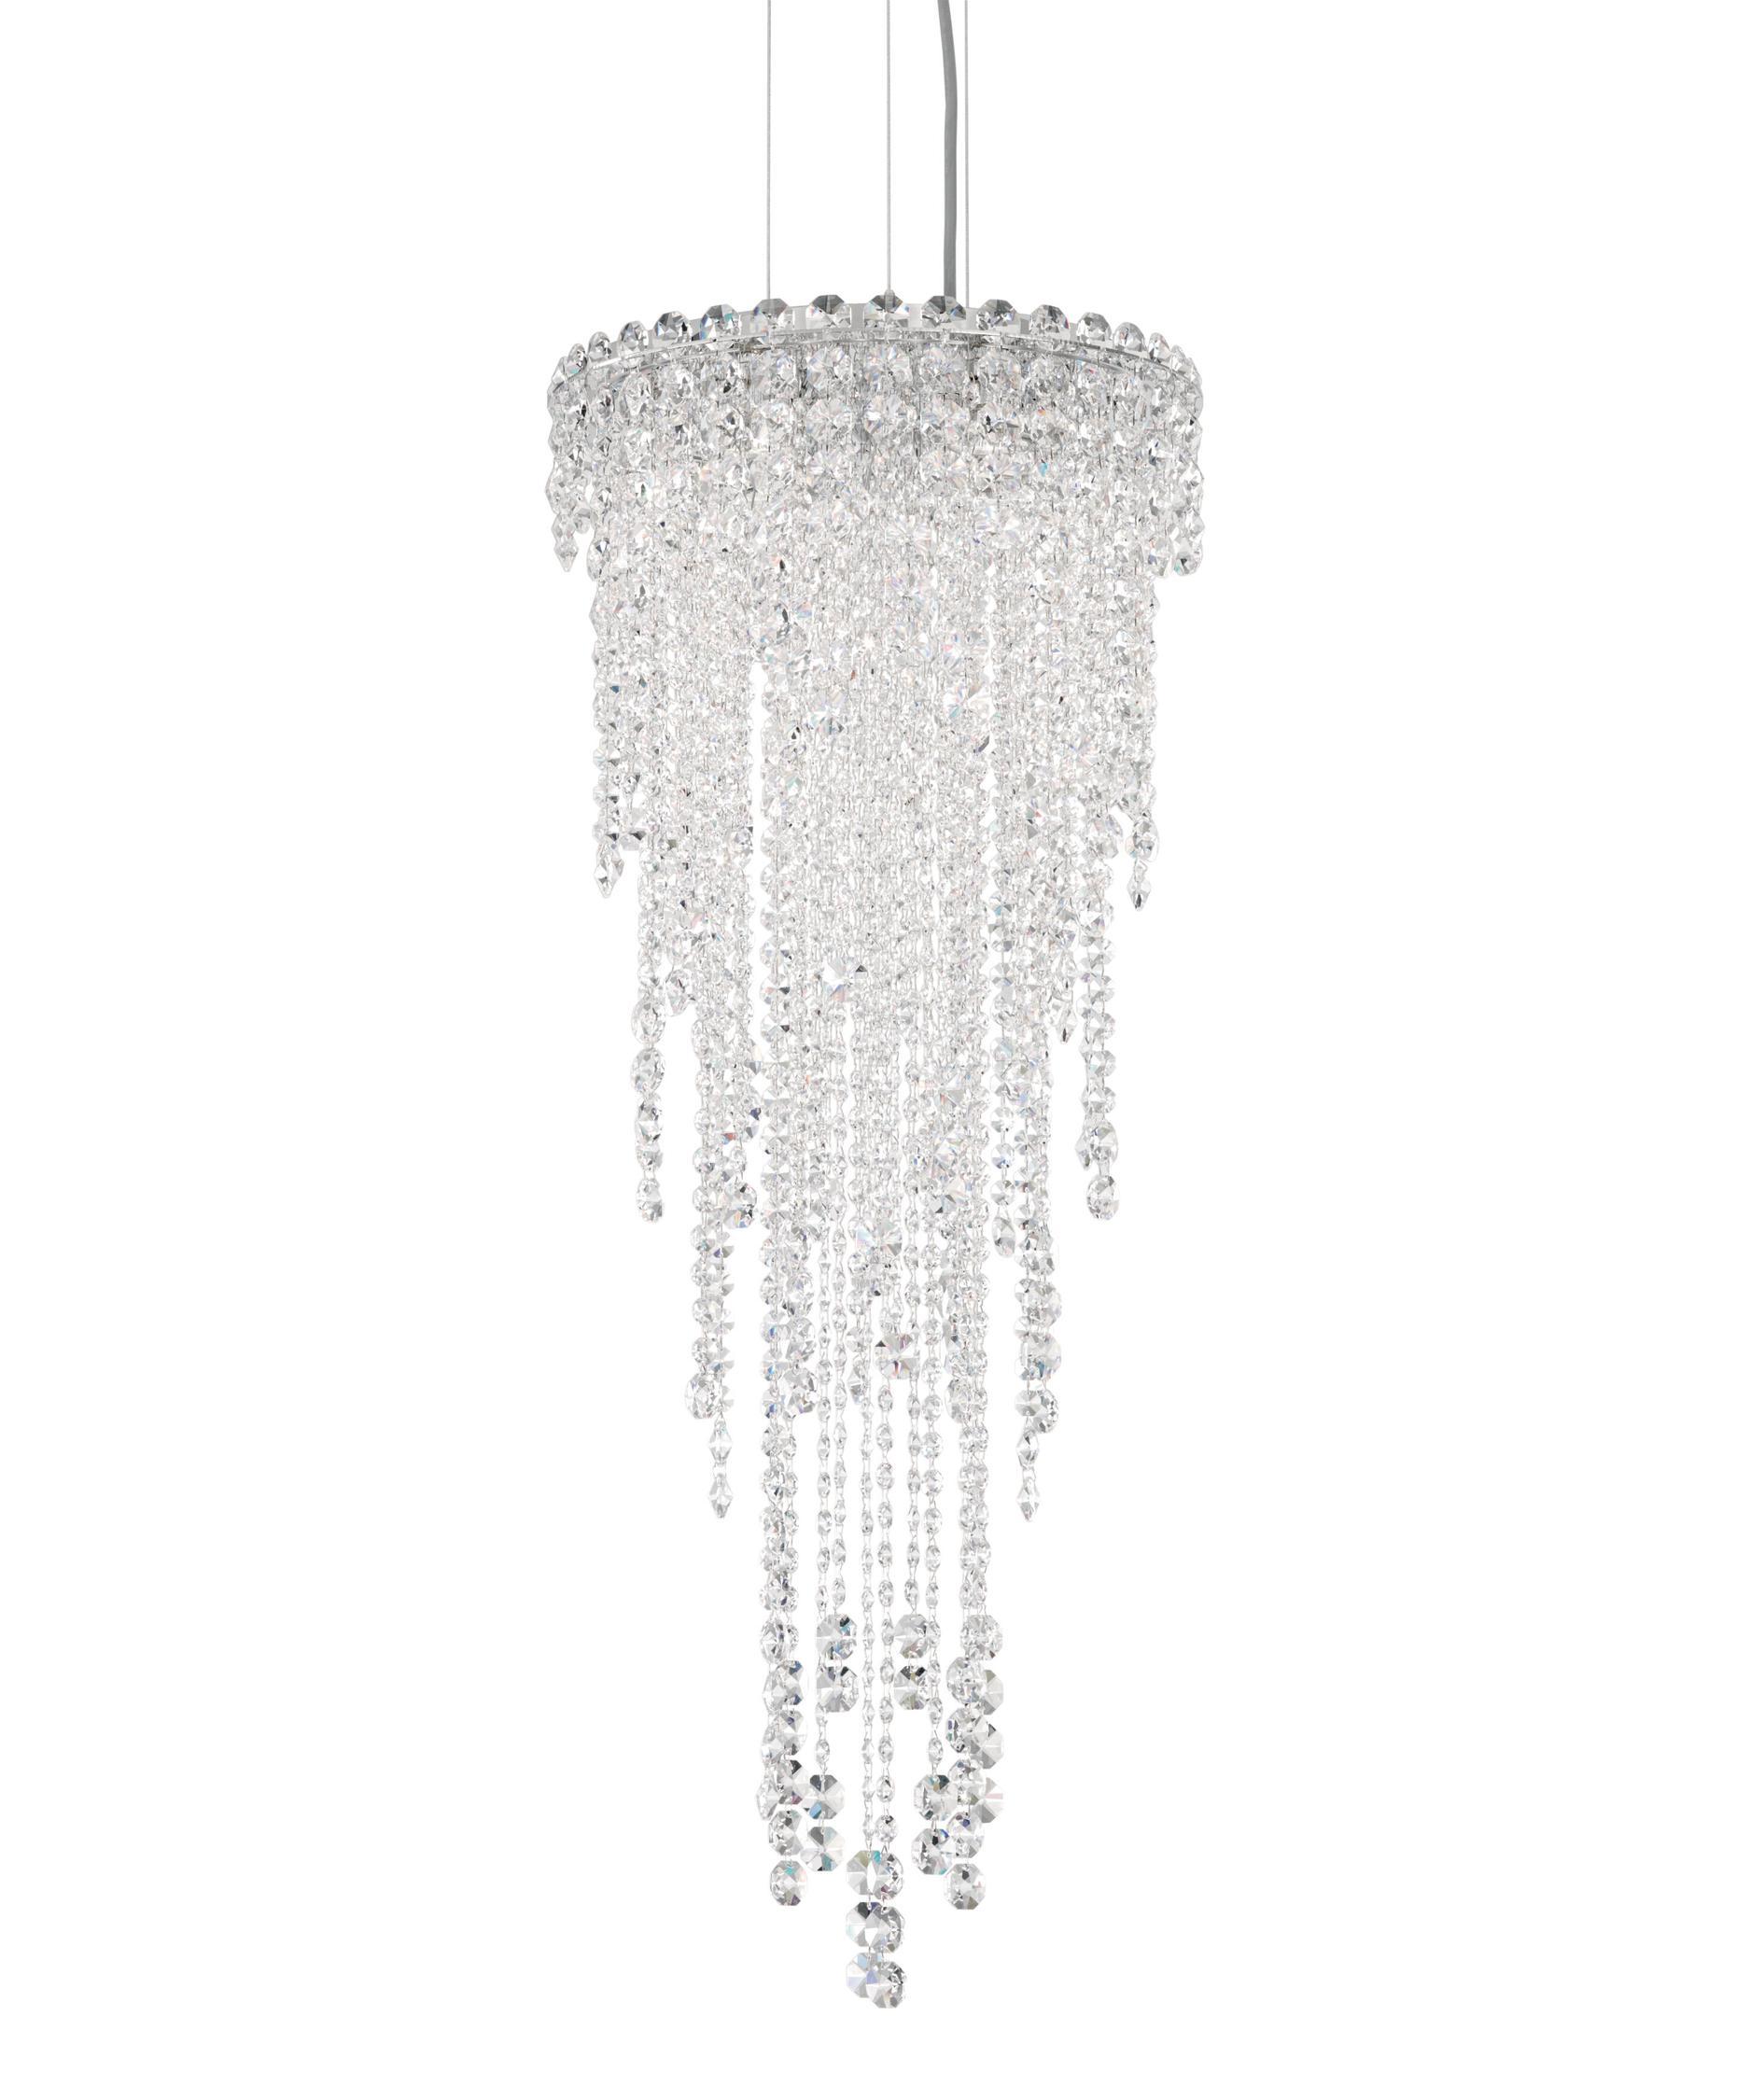 schonbek ch1212 chantant 14 inch wide 4 light mini pendant capitol lighting - Schonbek